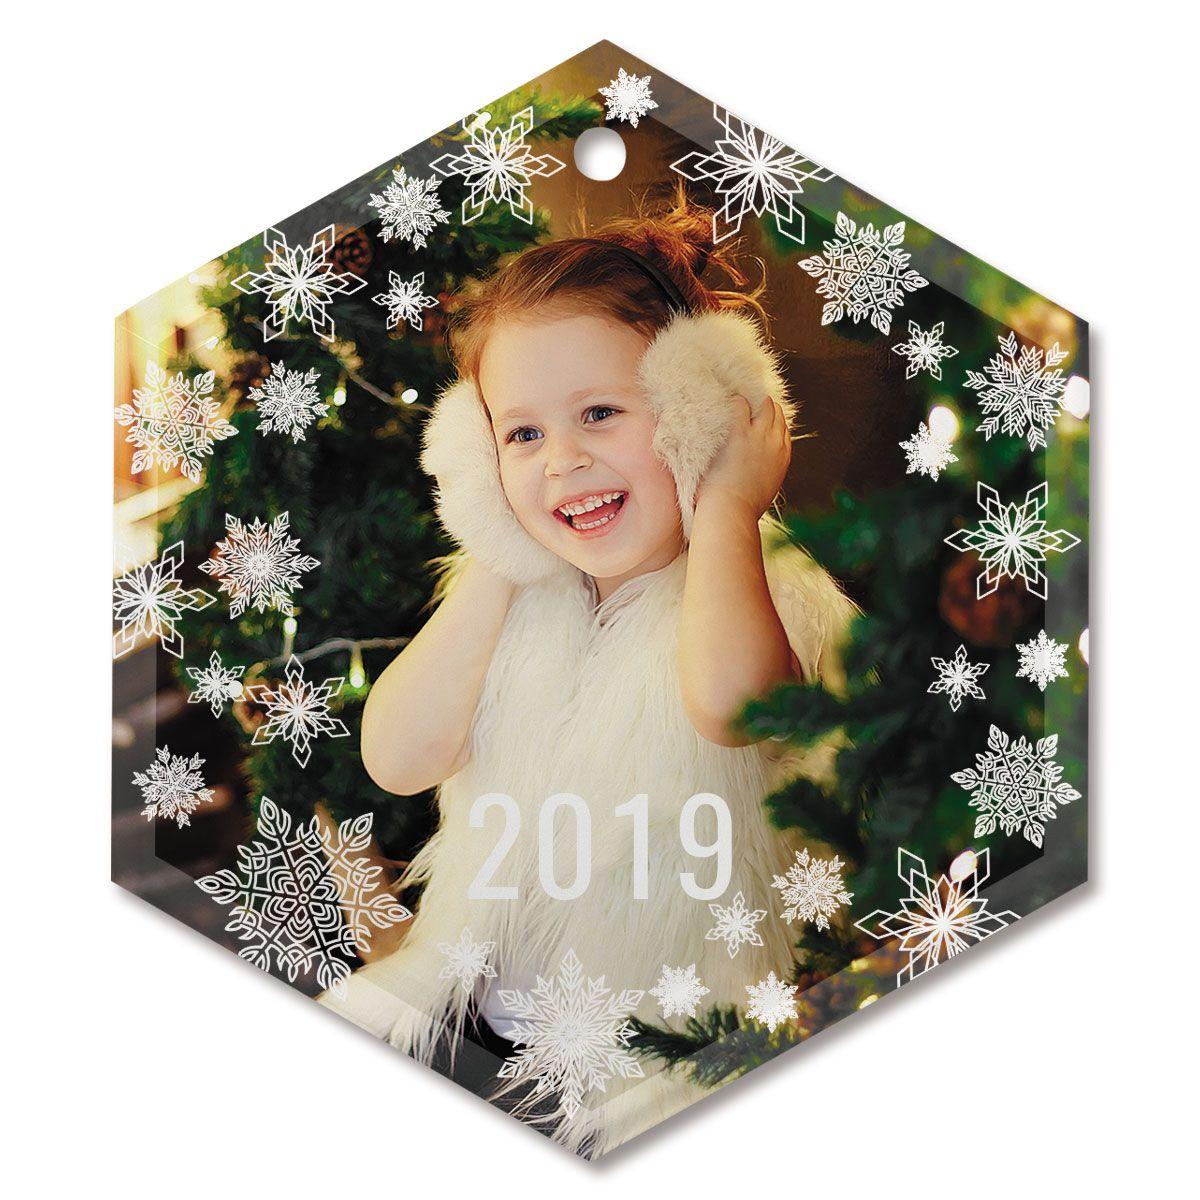 Snowflake Personalized Glass Hexagon Photo Ornament